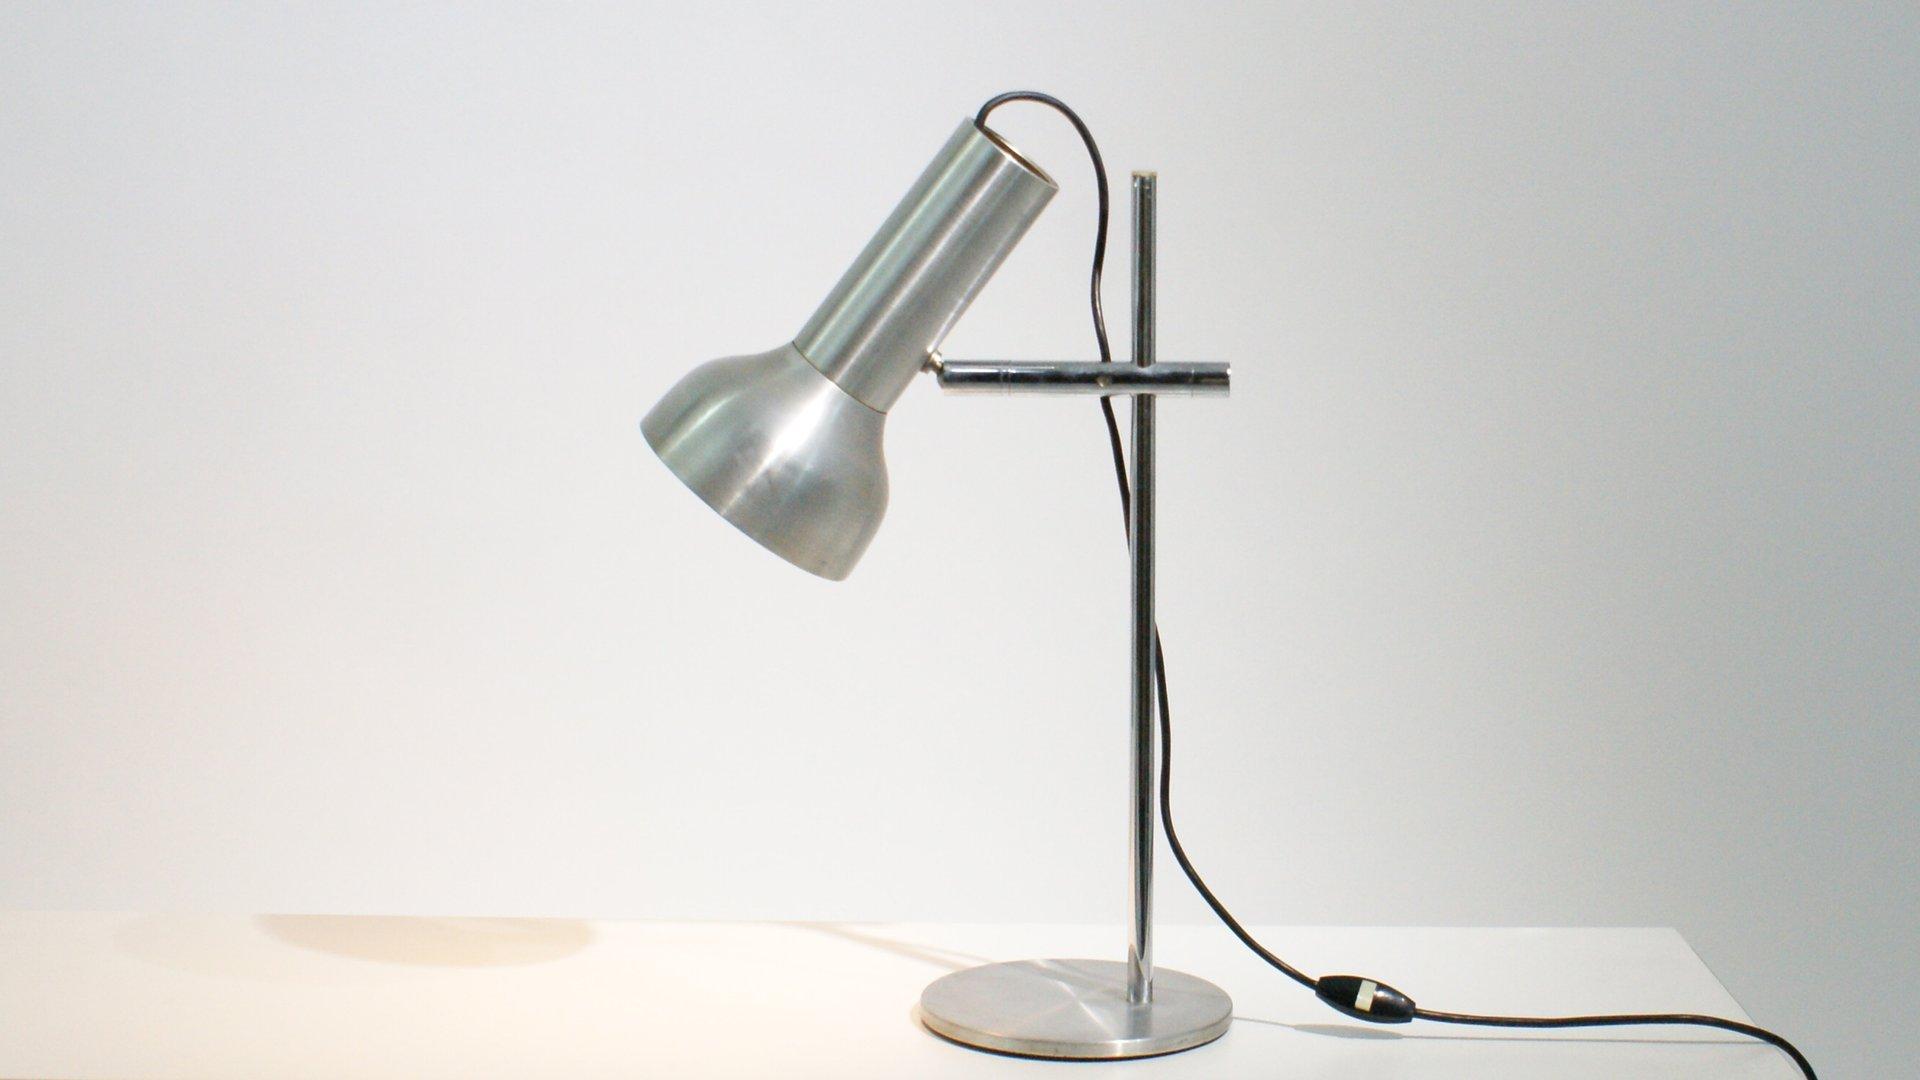 Lampe de bureau ajustable industrielle en aluminium press 1950s en vente sur pamono - Lampe bureau industrielle ...